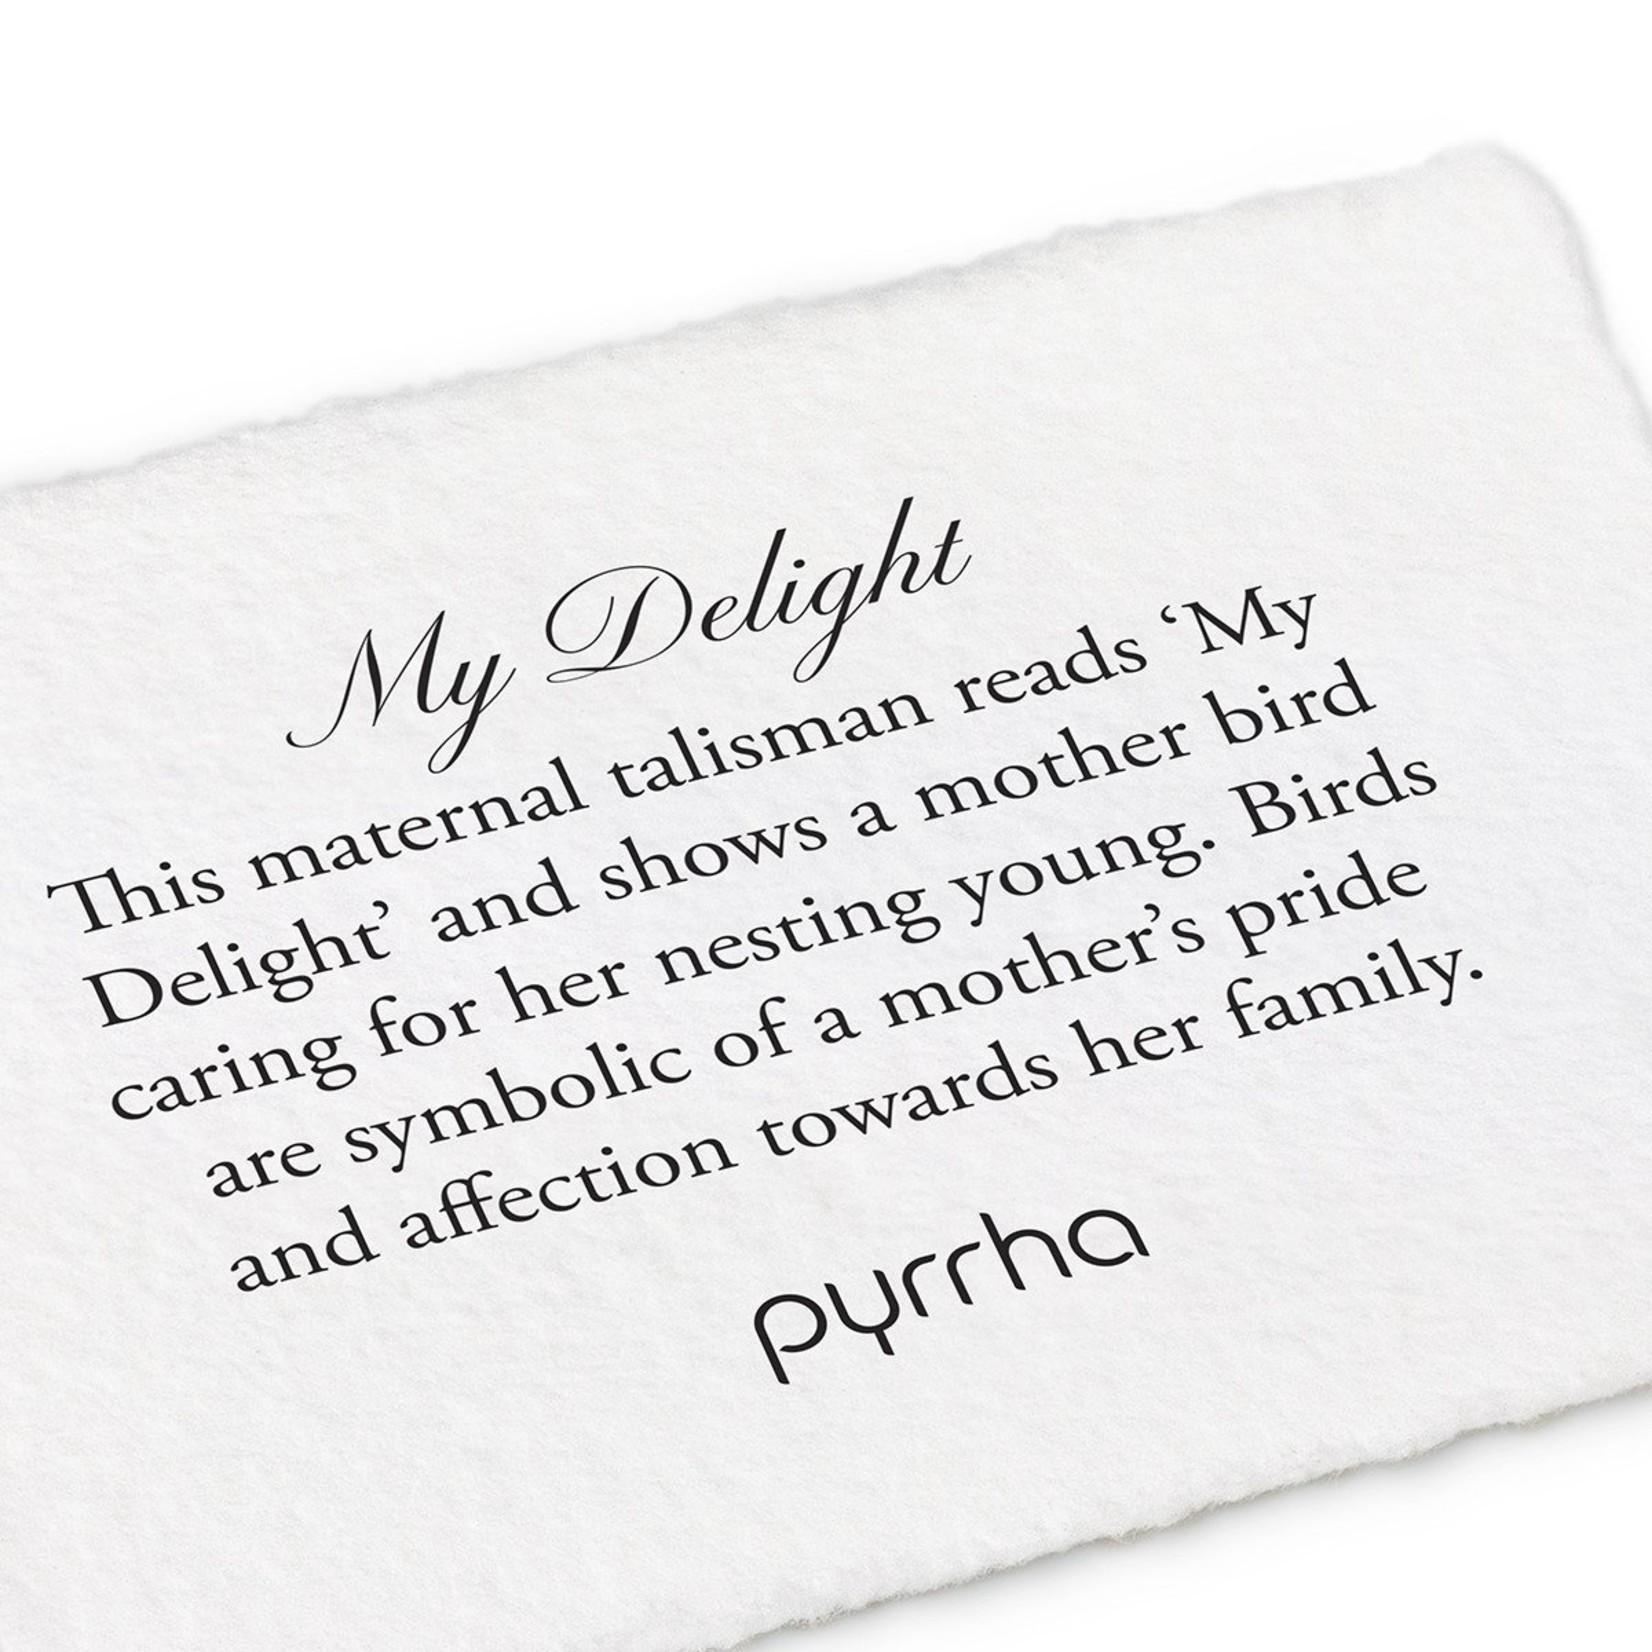 Pyrrha My Delight Signature Talisman